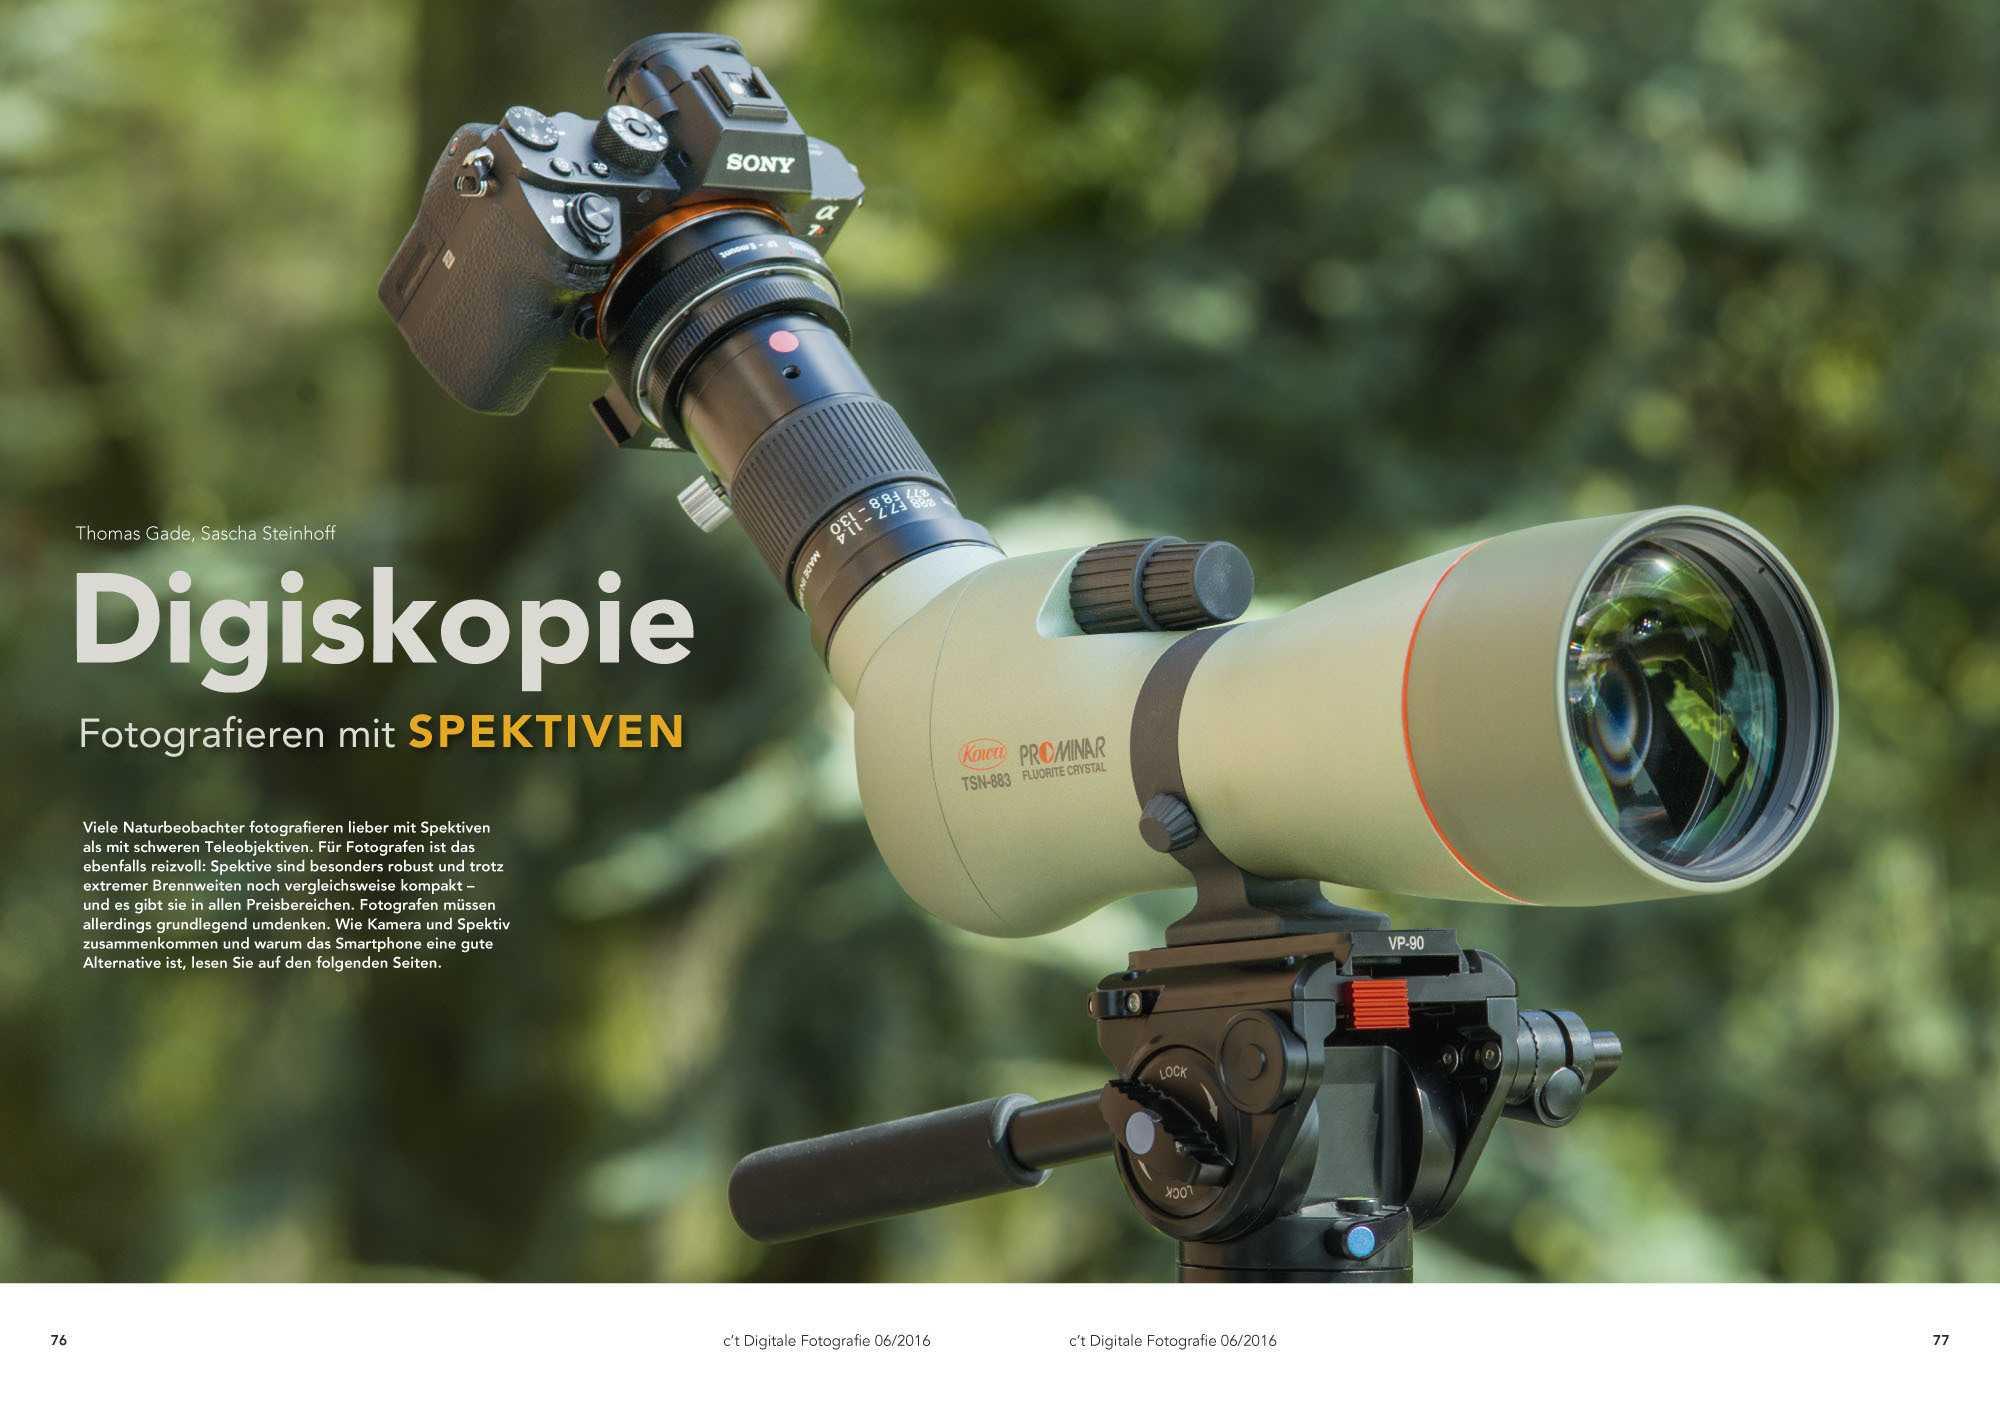 c't Fotografie: Digiskopie - Fotografieren mit Spektiven